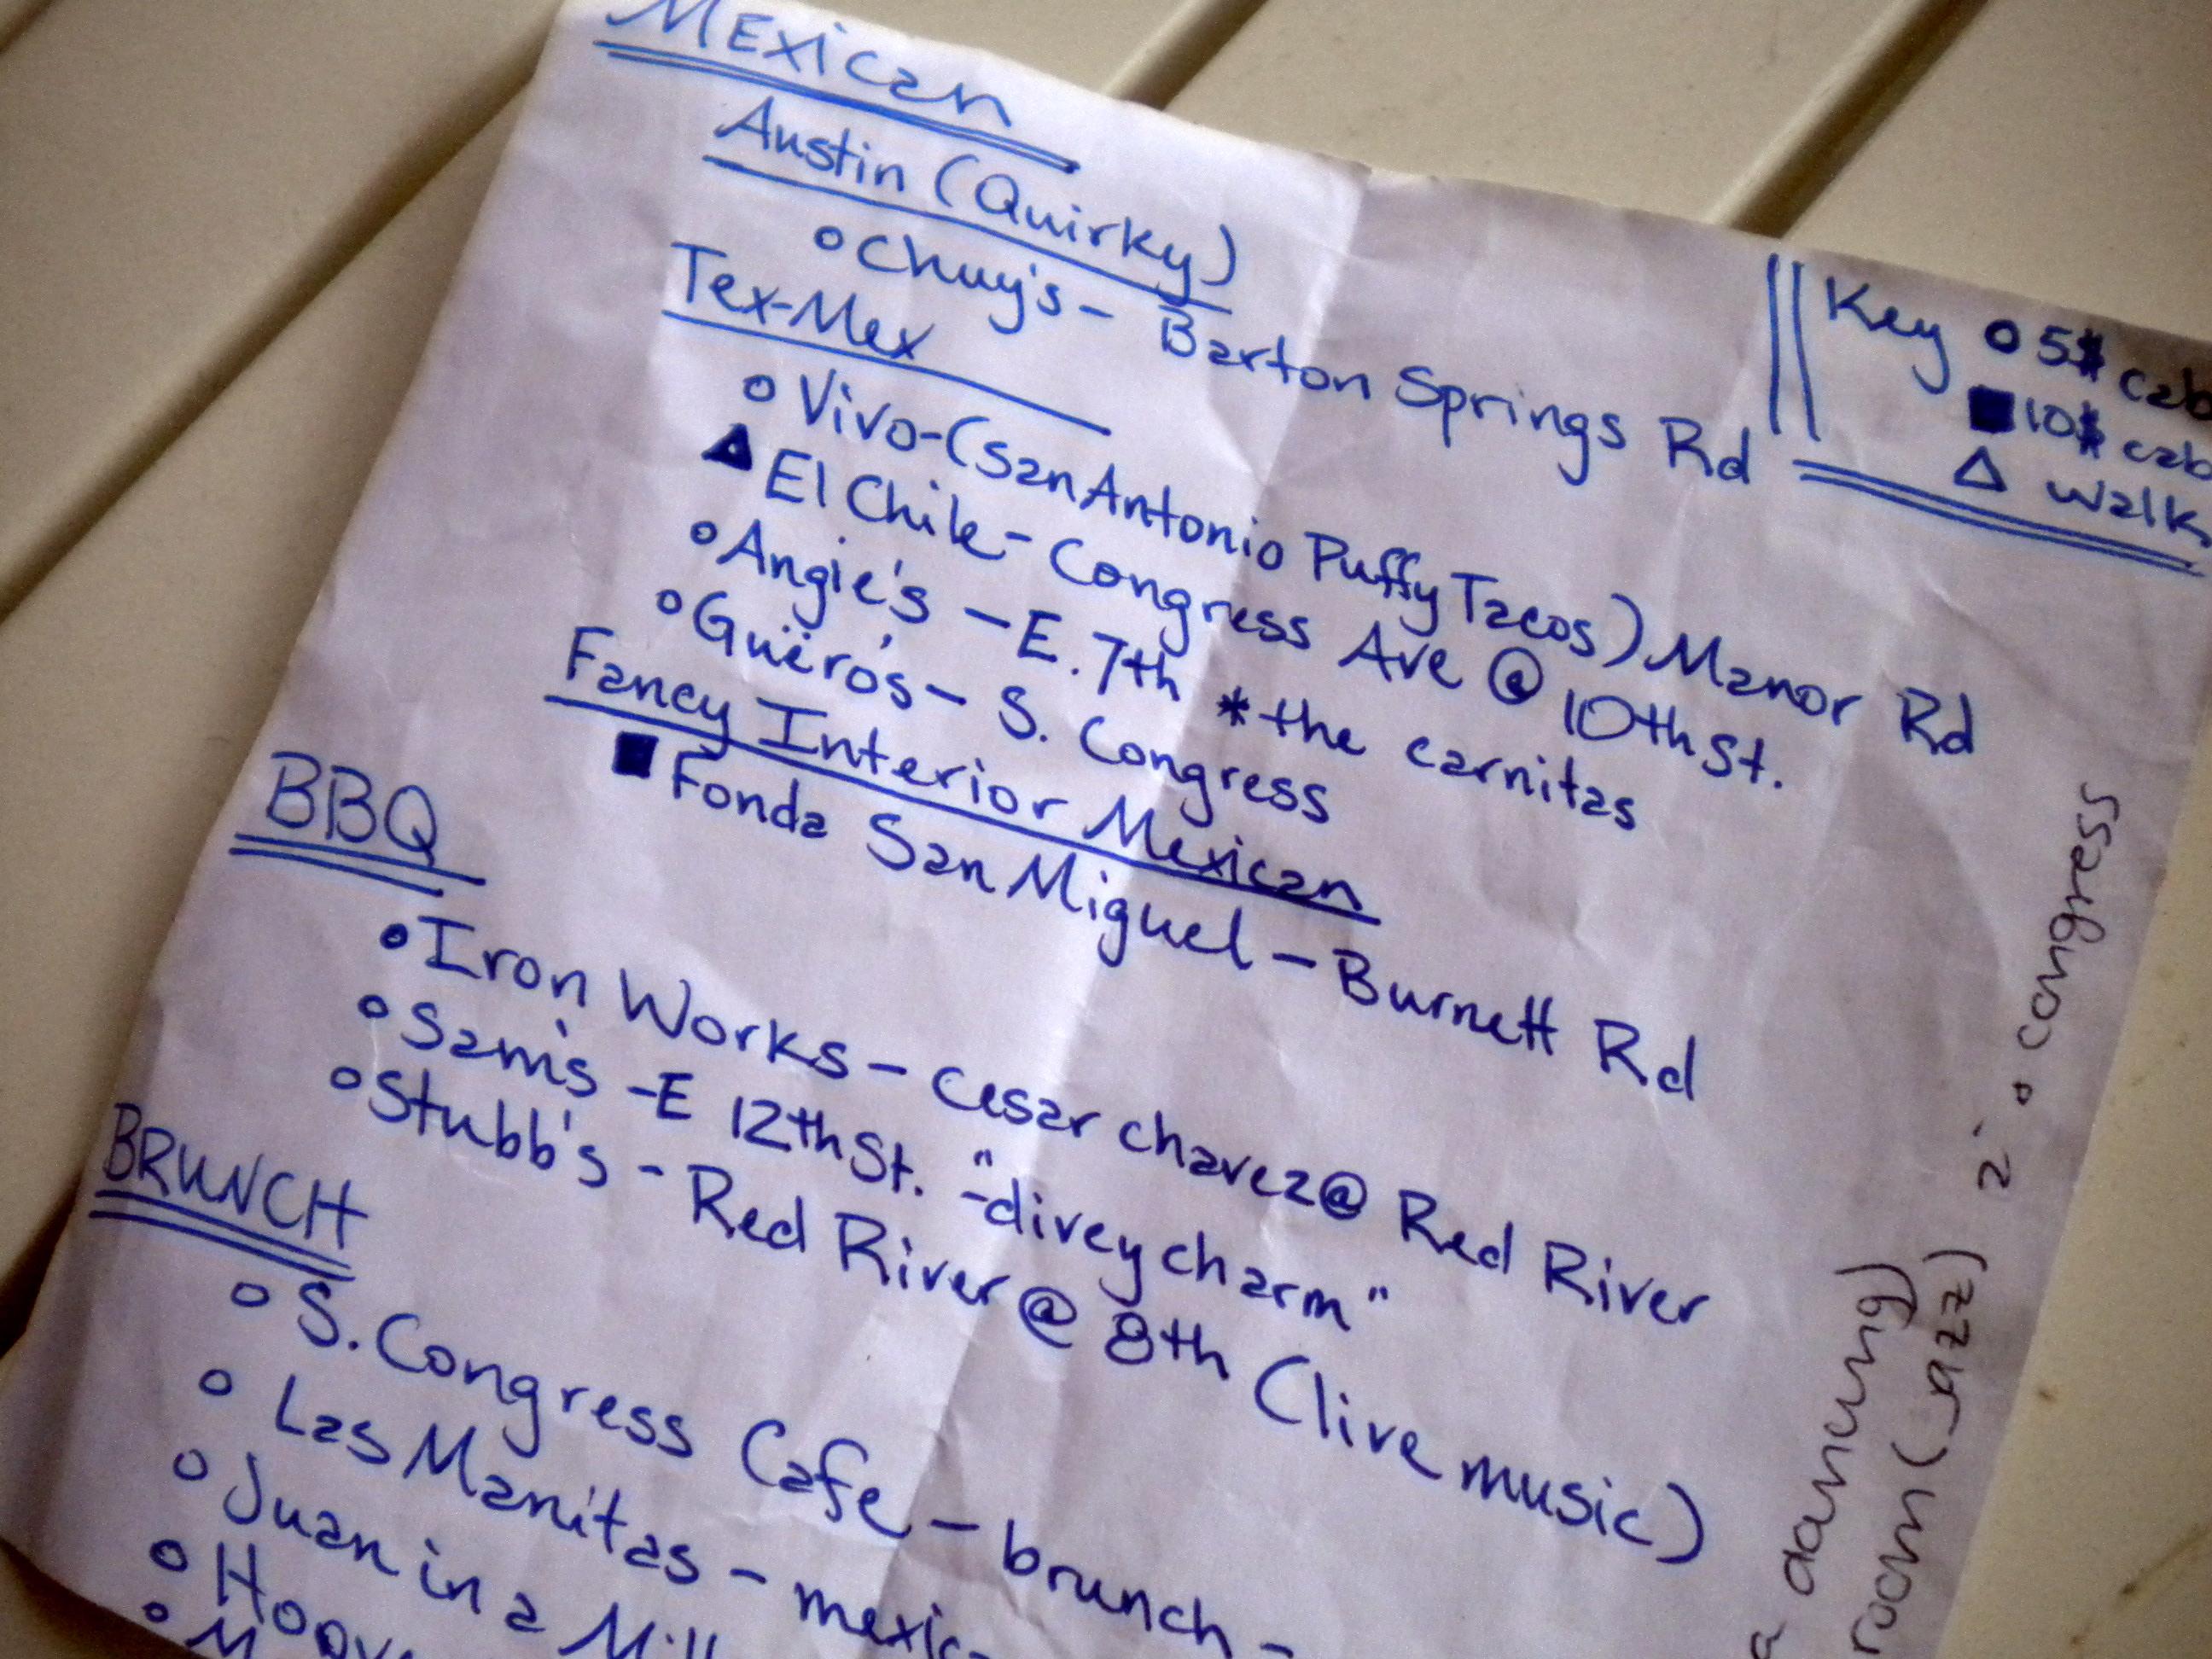 restaurant suggestions